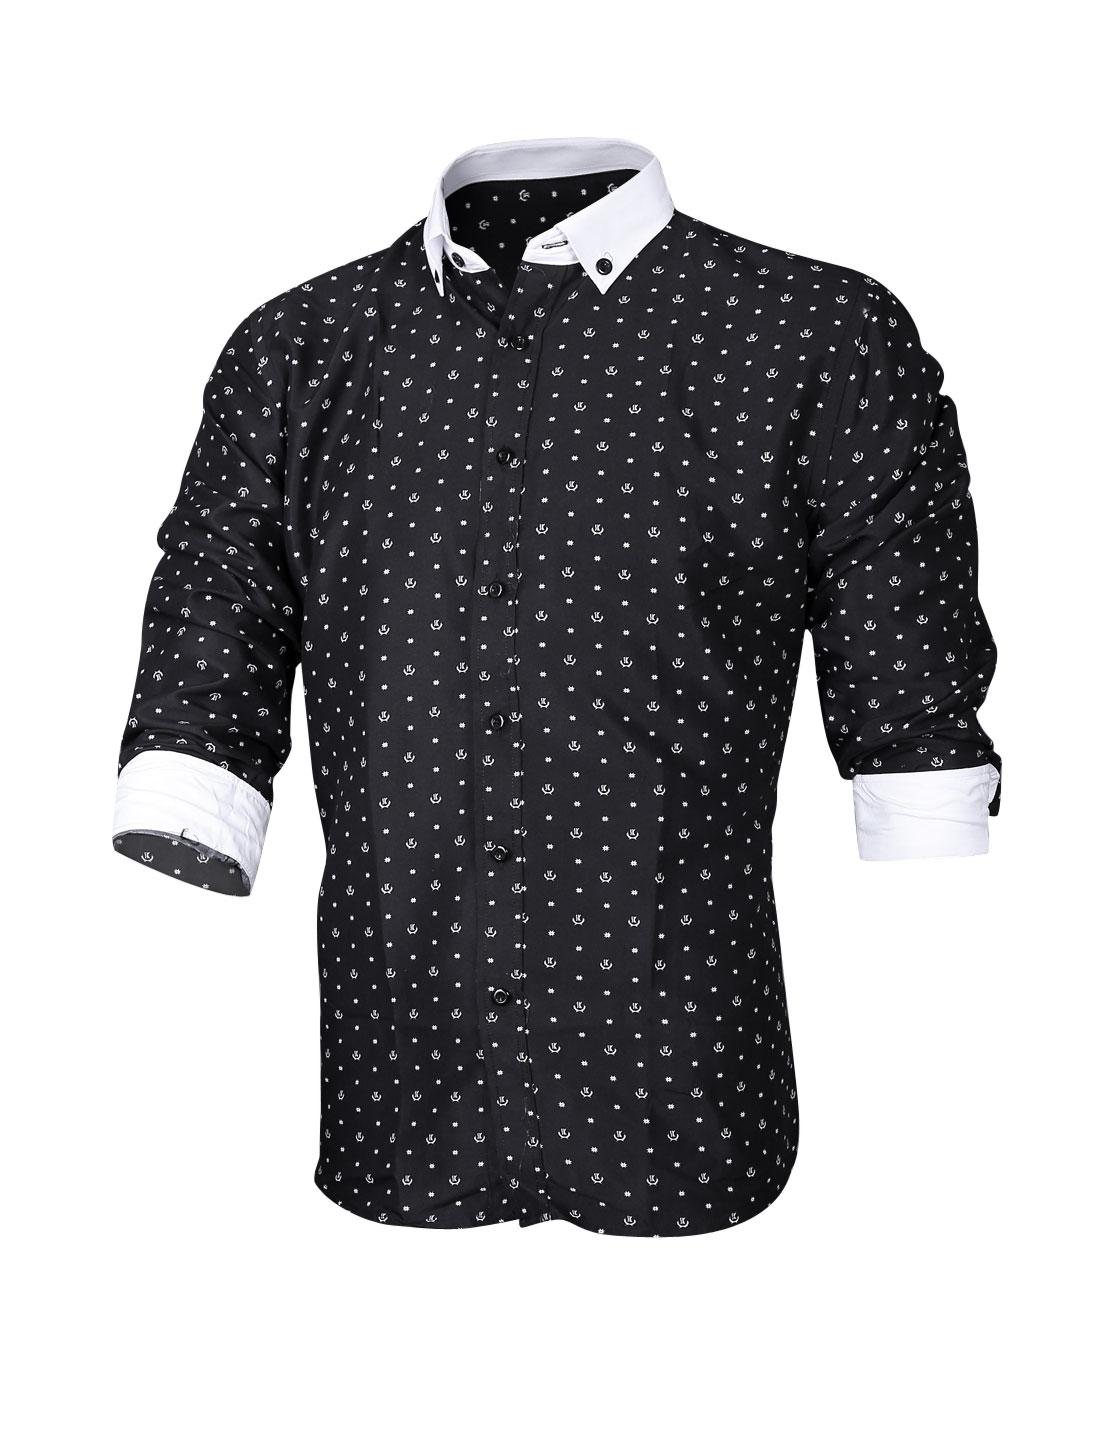 Men Allover Novelty Pattern Button Up Casual Shirt Black M